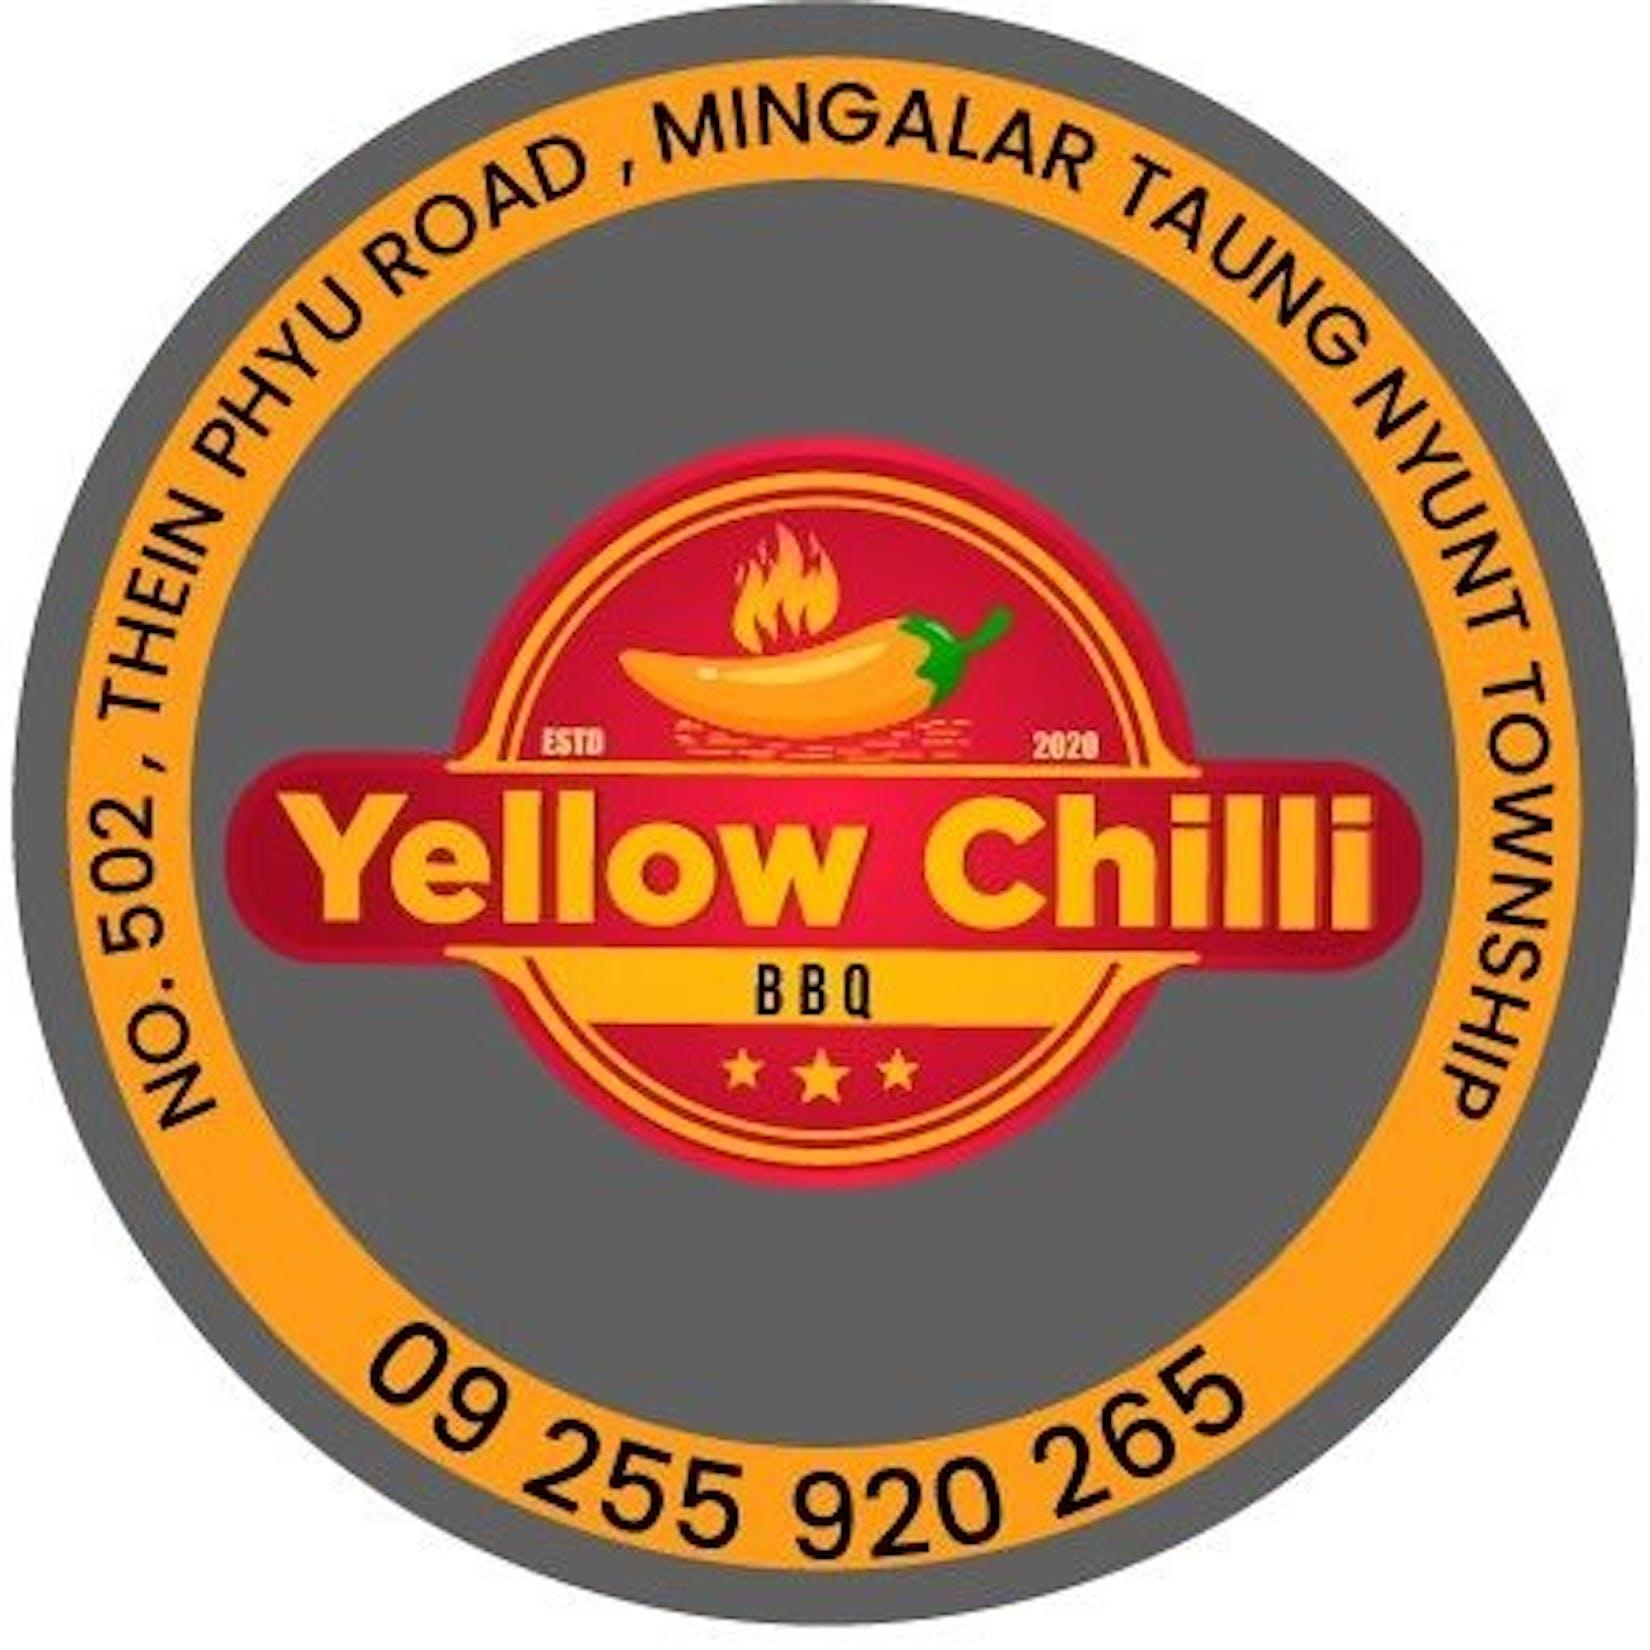 Yellow Chilli Myanmar | yathar